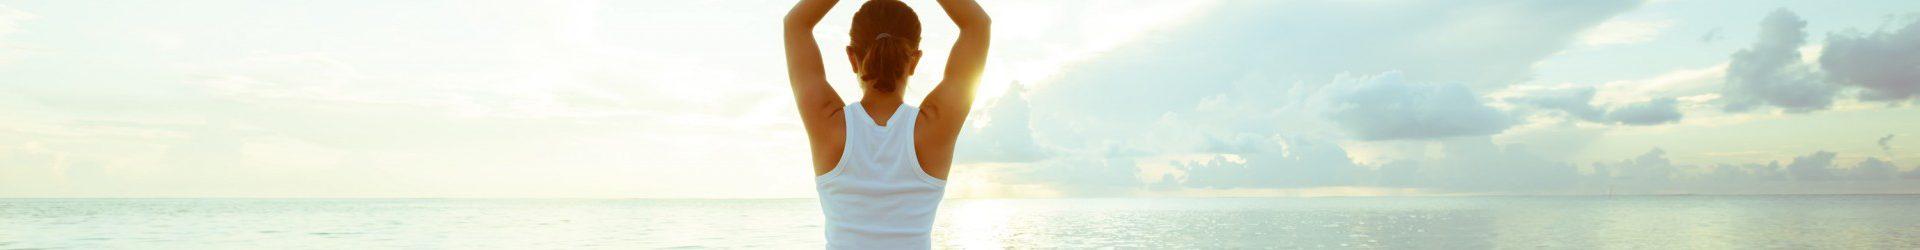 Yoga ed emozioni